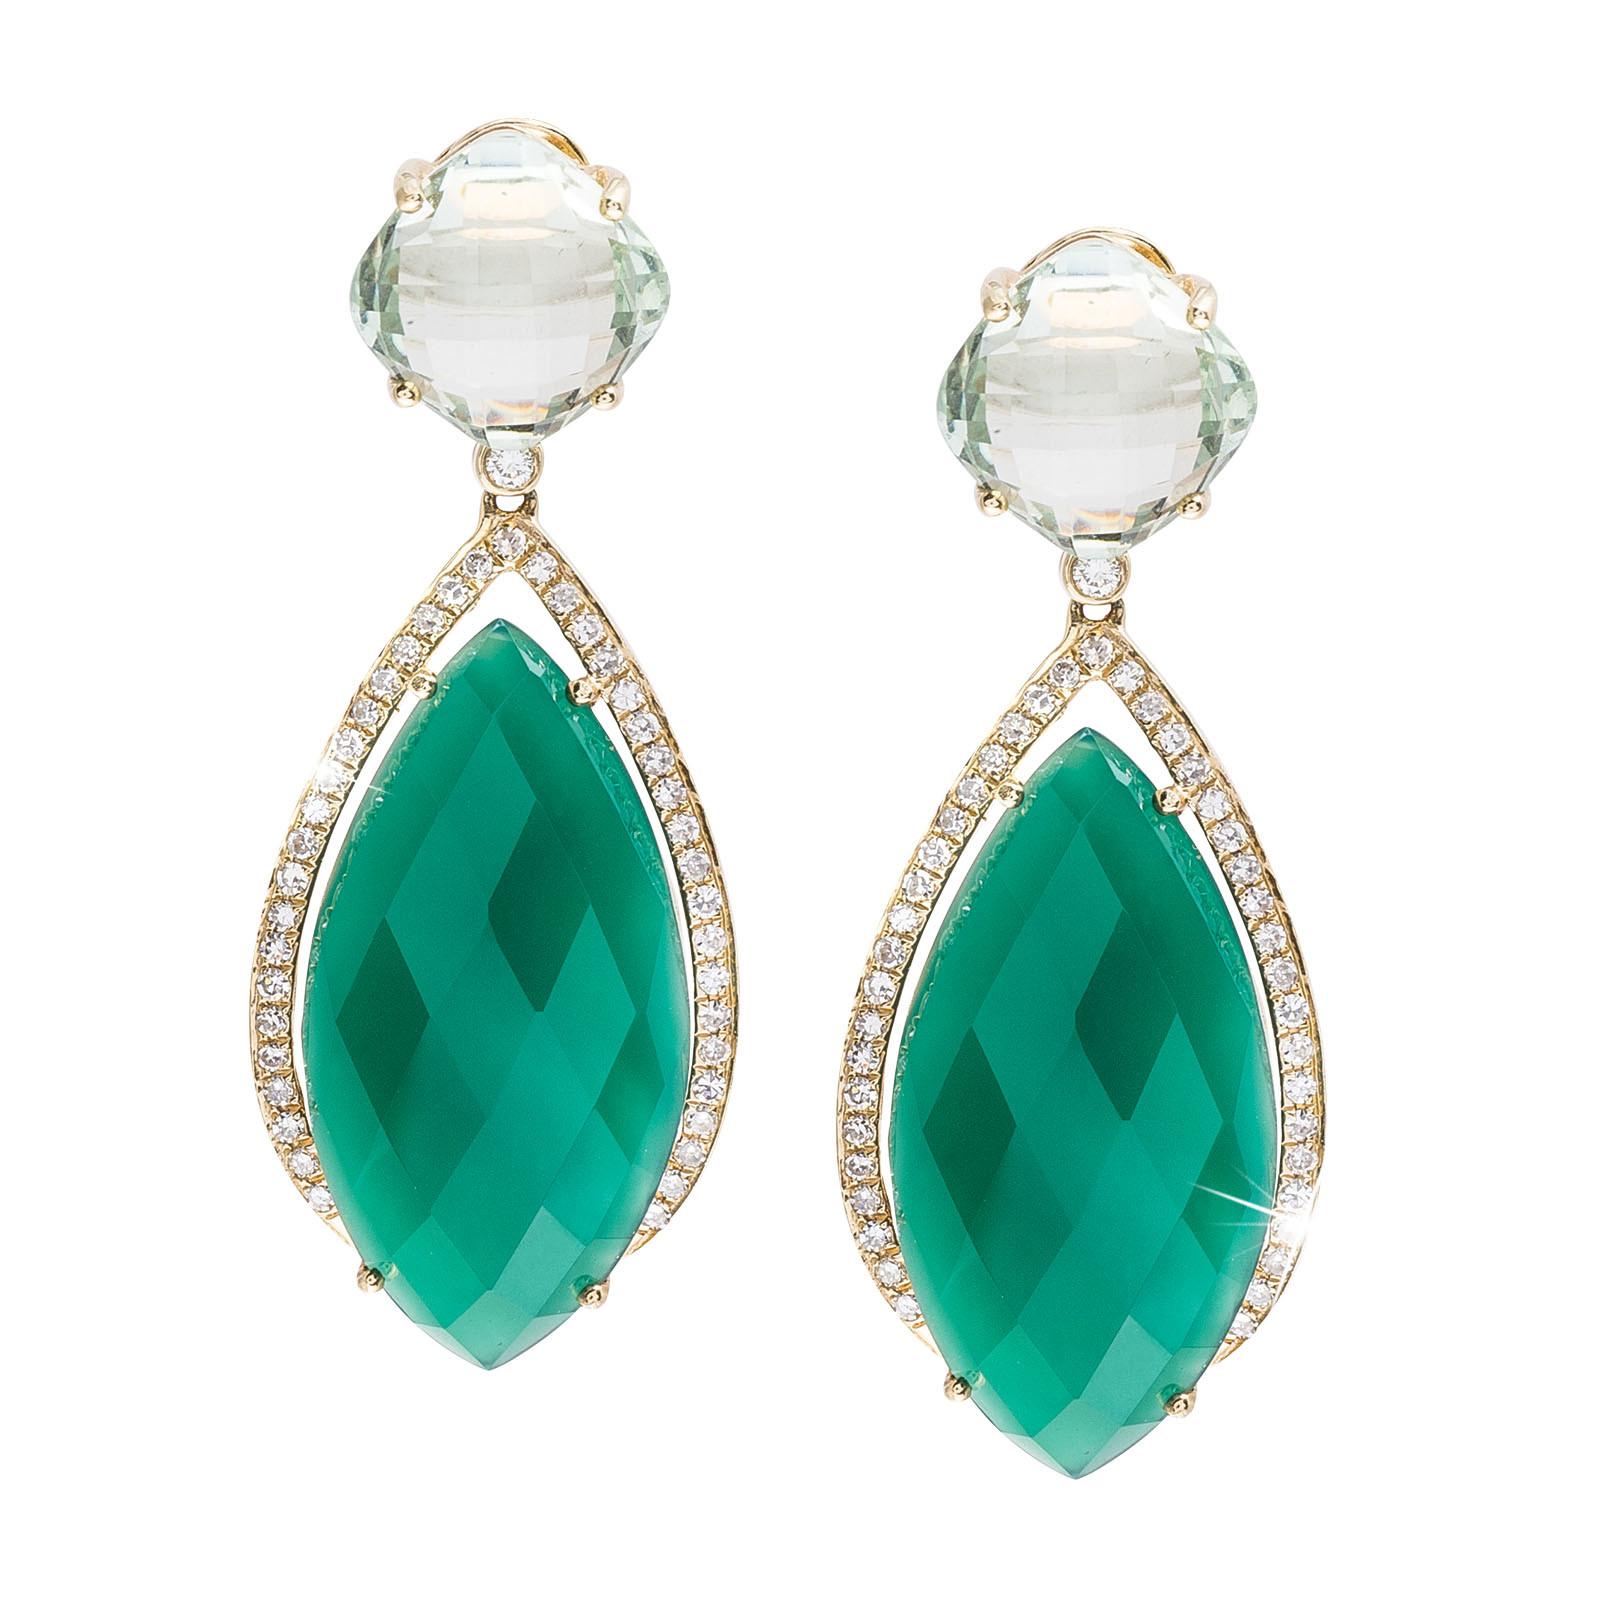 New Madison L 7.66 CTW Diamond, Green Amethyst & Agate Earrings